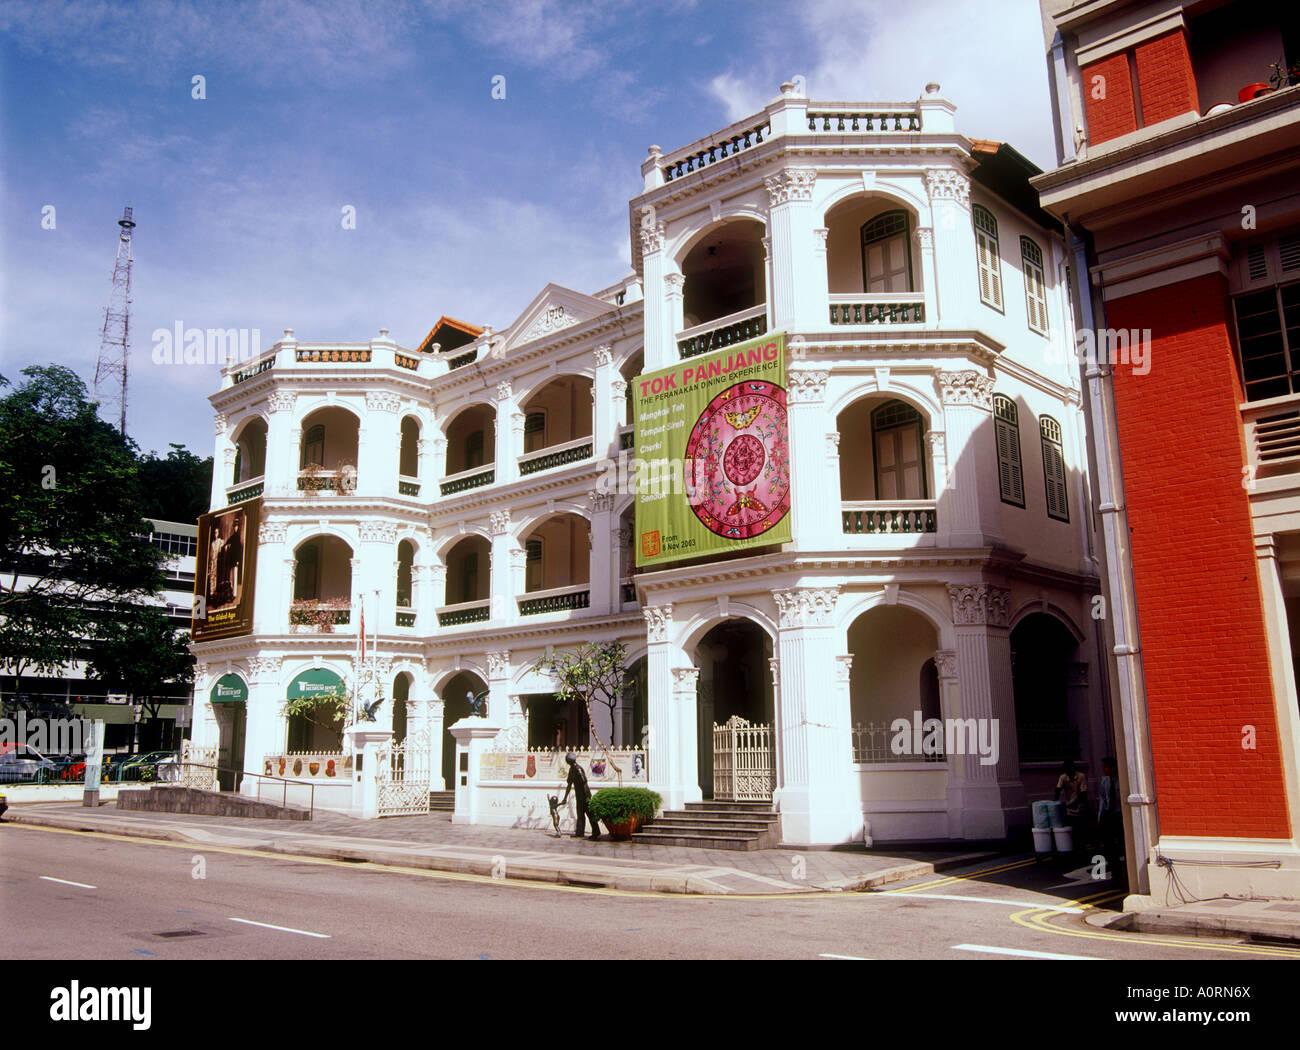 Asian Civilisations Museum - Stock Image